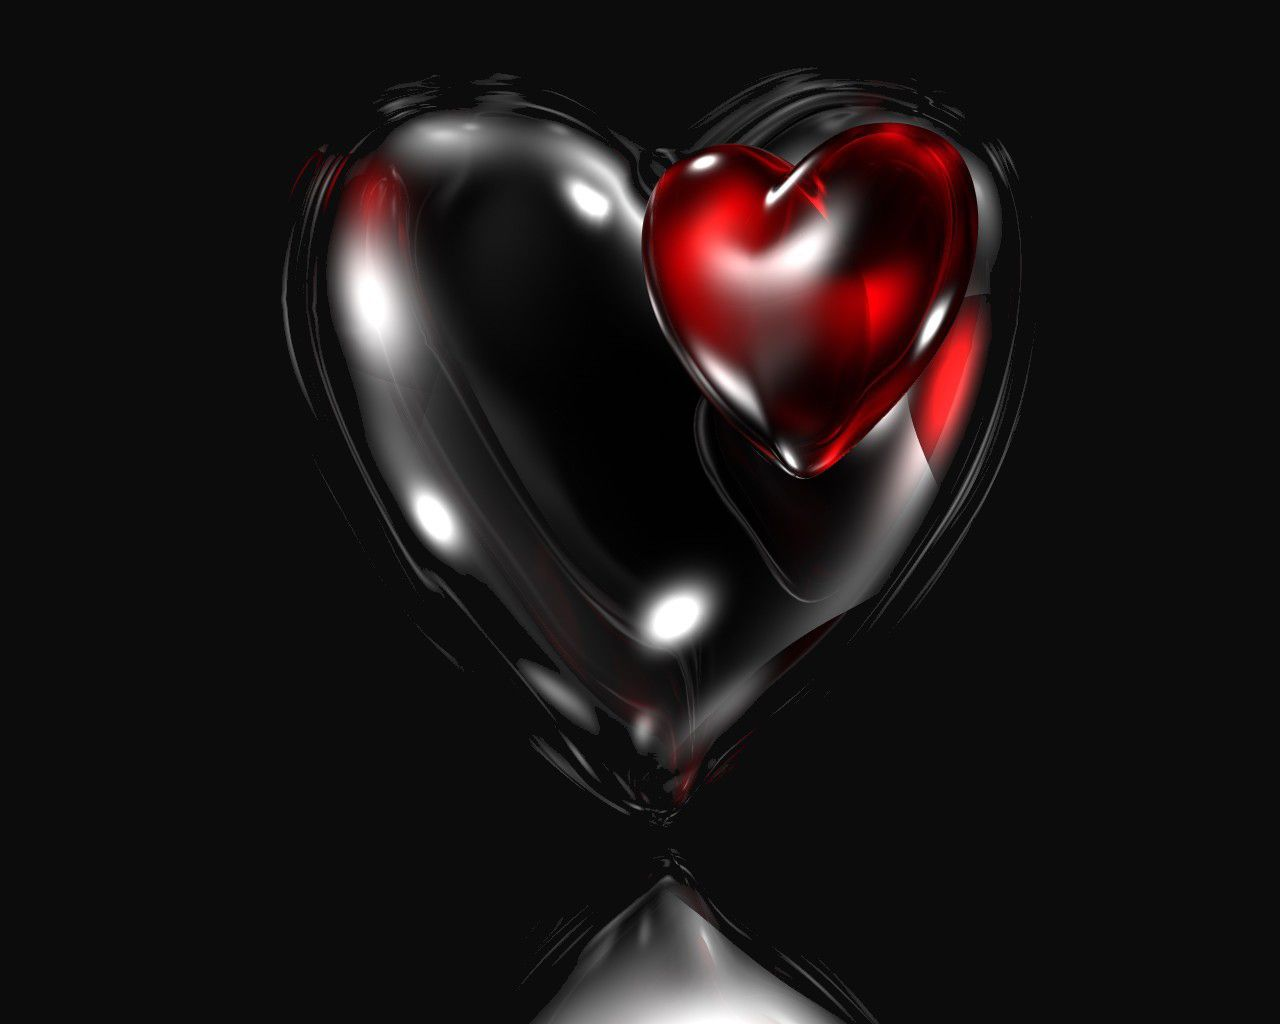 sweet heart, 3d, abstract, black, dark, heart, love | ღ~ i